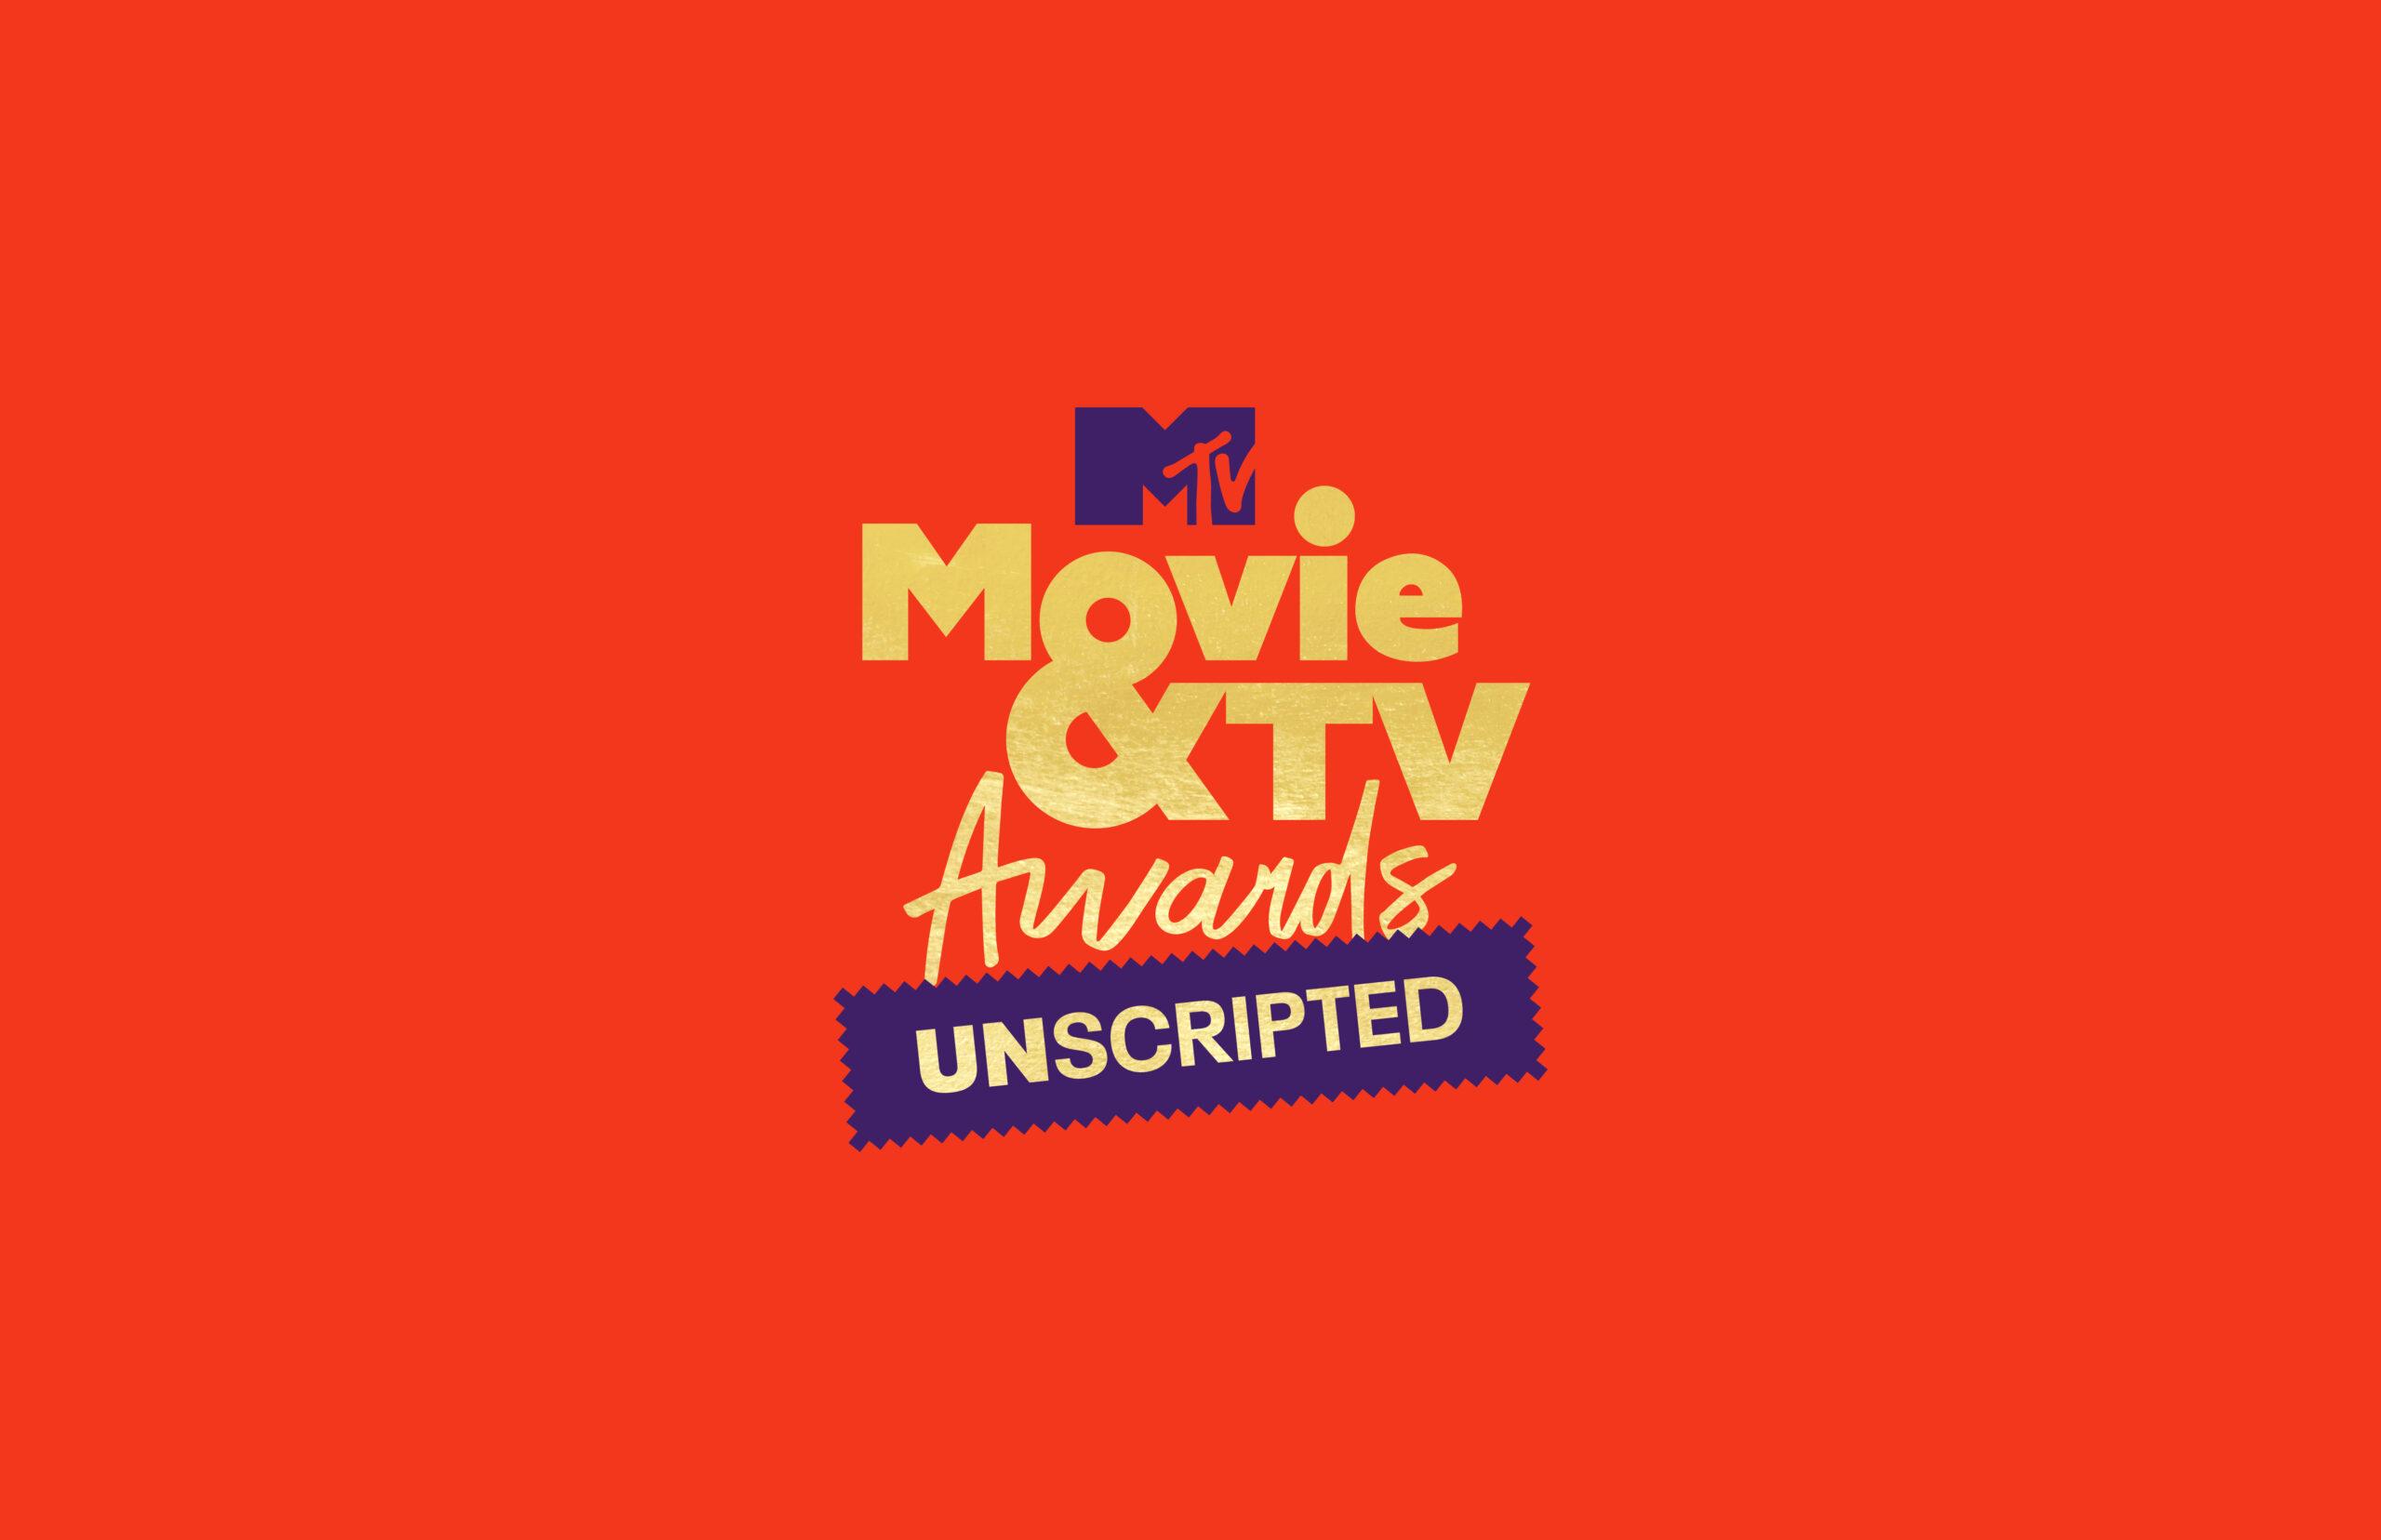 MTV Movies TV Awards